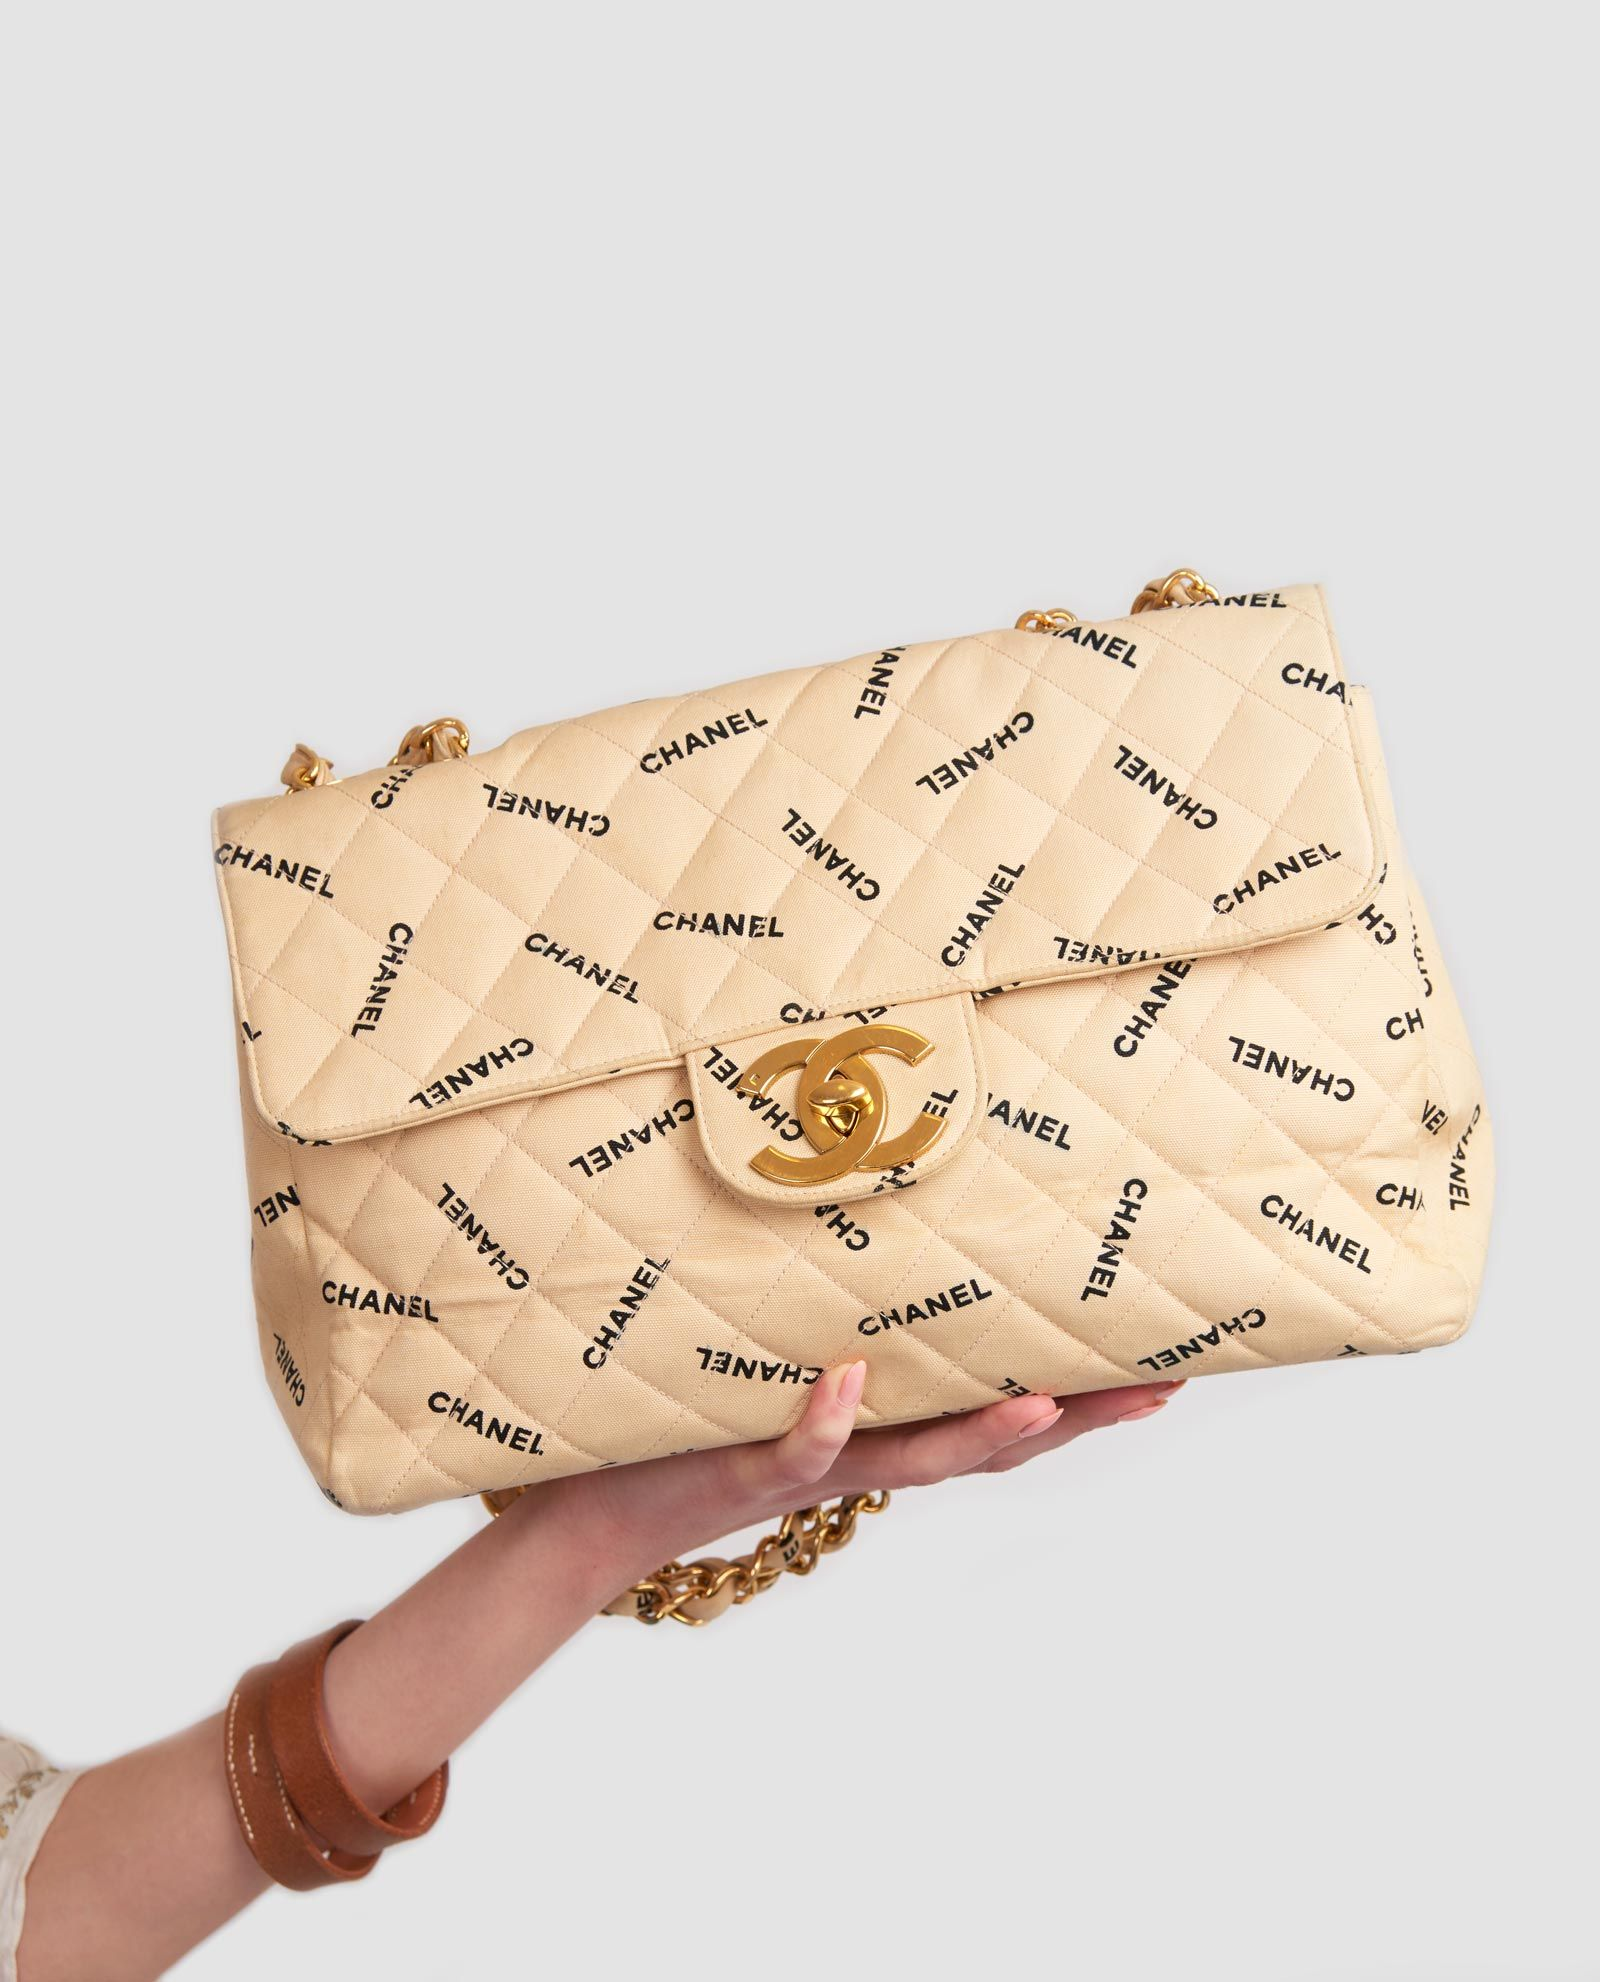 3407f883d58dd7 Vintage Chanel canvas monogram jumbo xl flap bag   Chanel Beauty ...